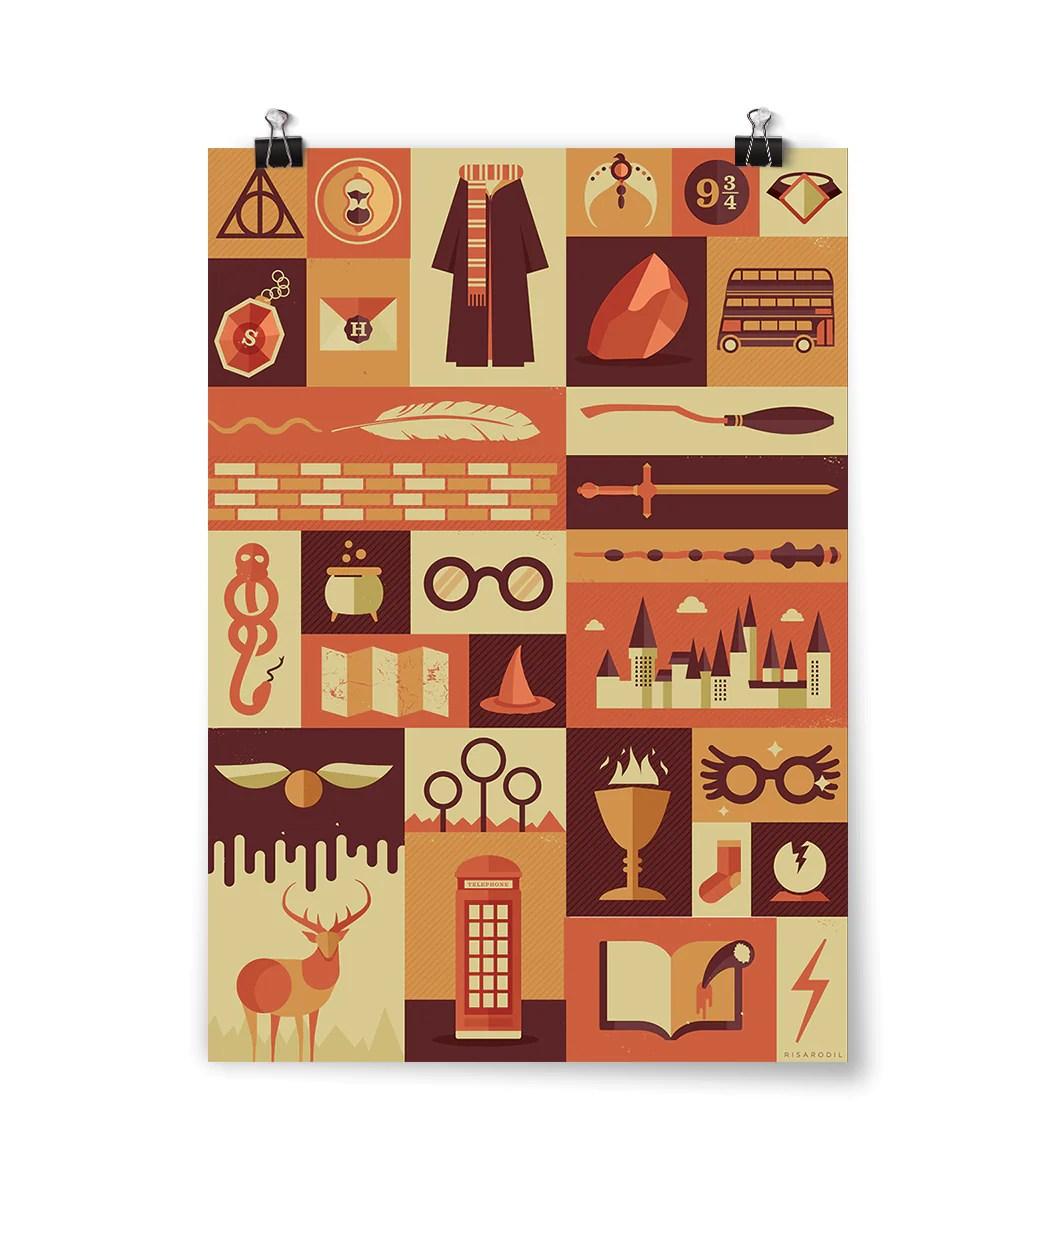 Harry Potter Items Poster Dftba